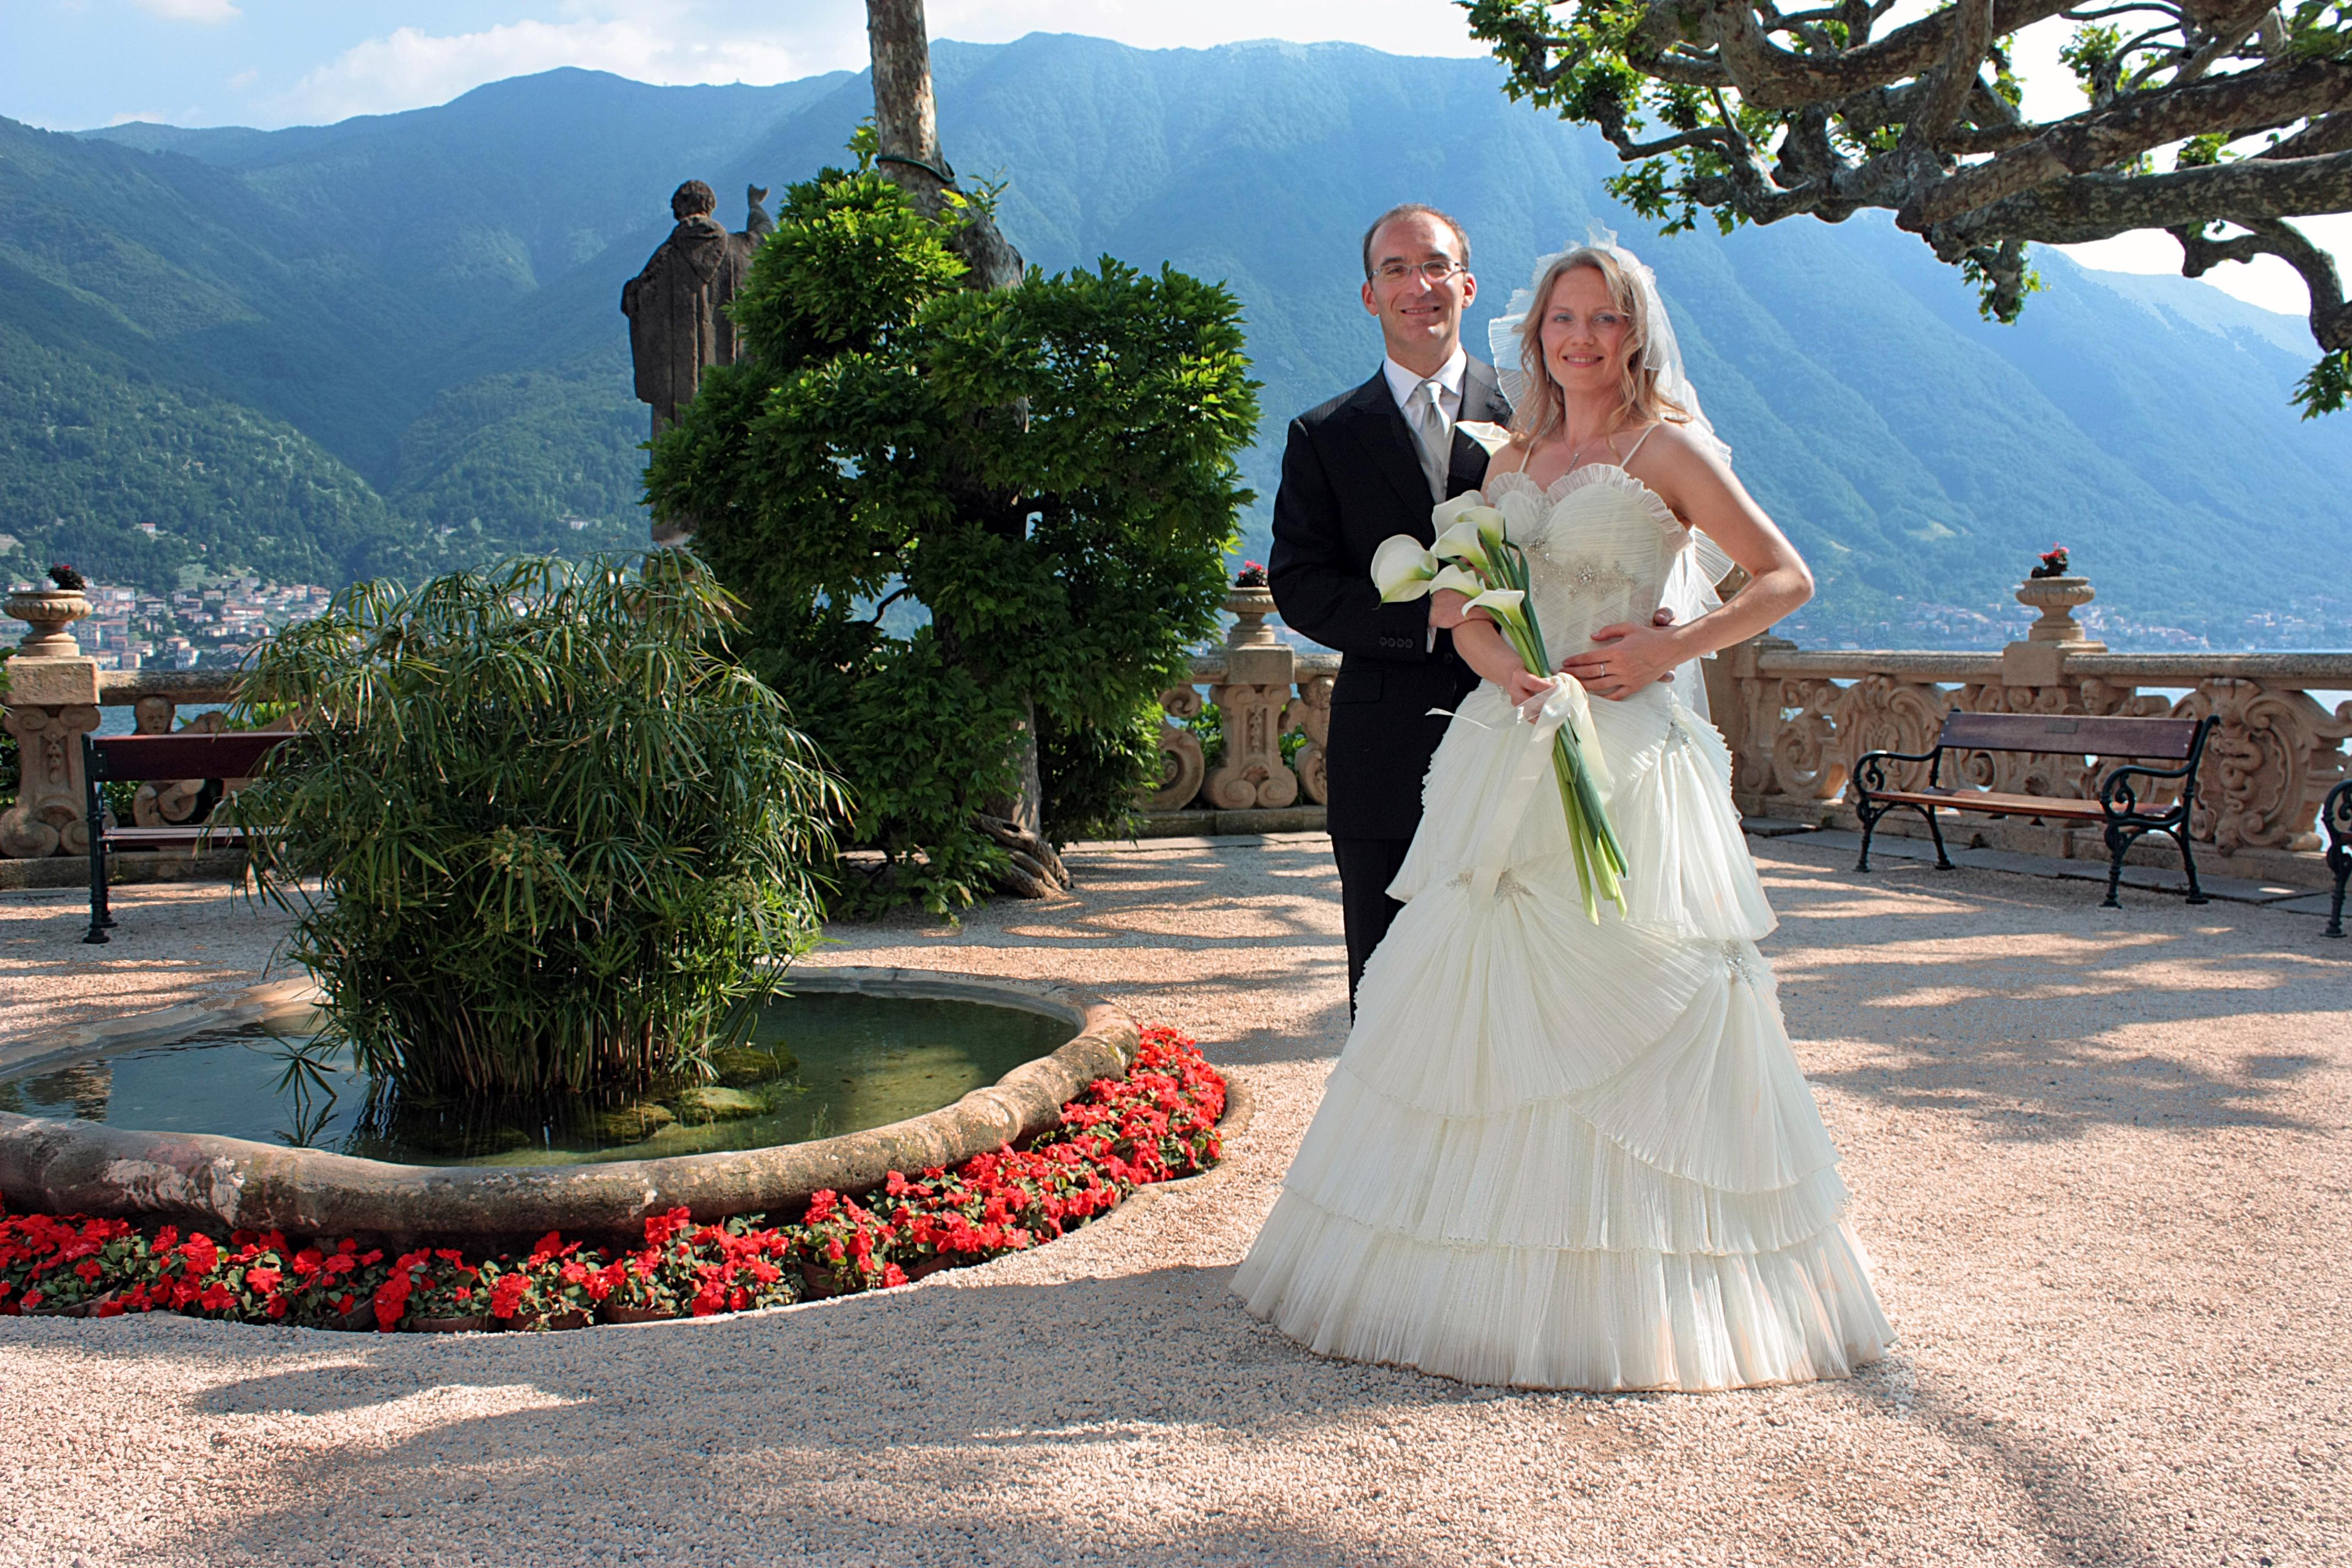 свадьба на озере Комо, вилла Балбьянелло